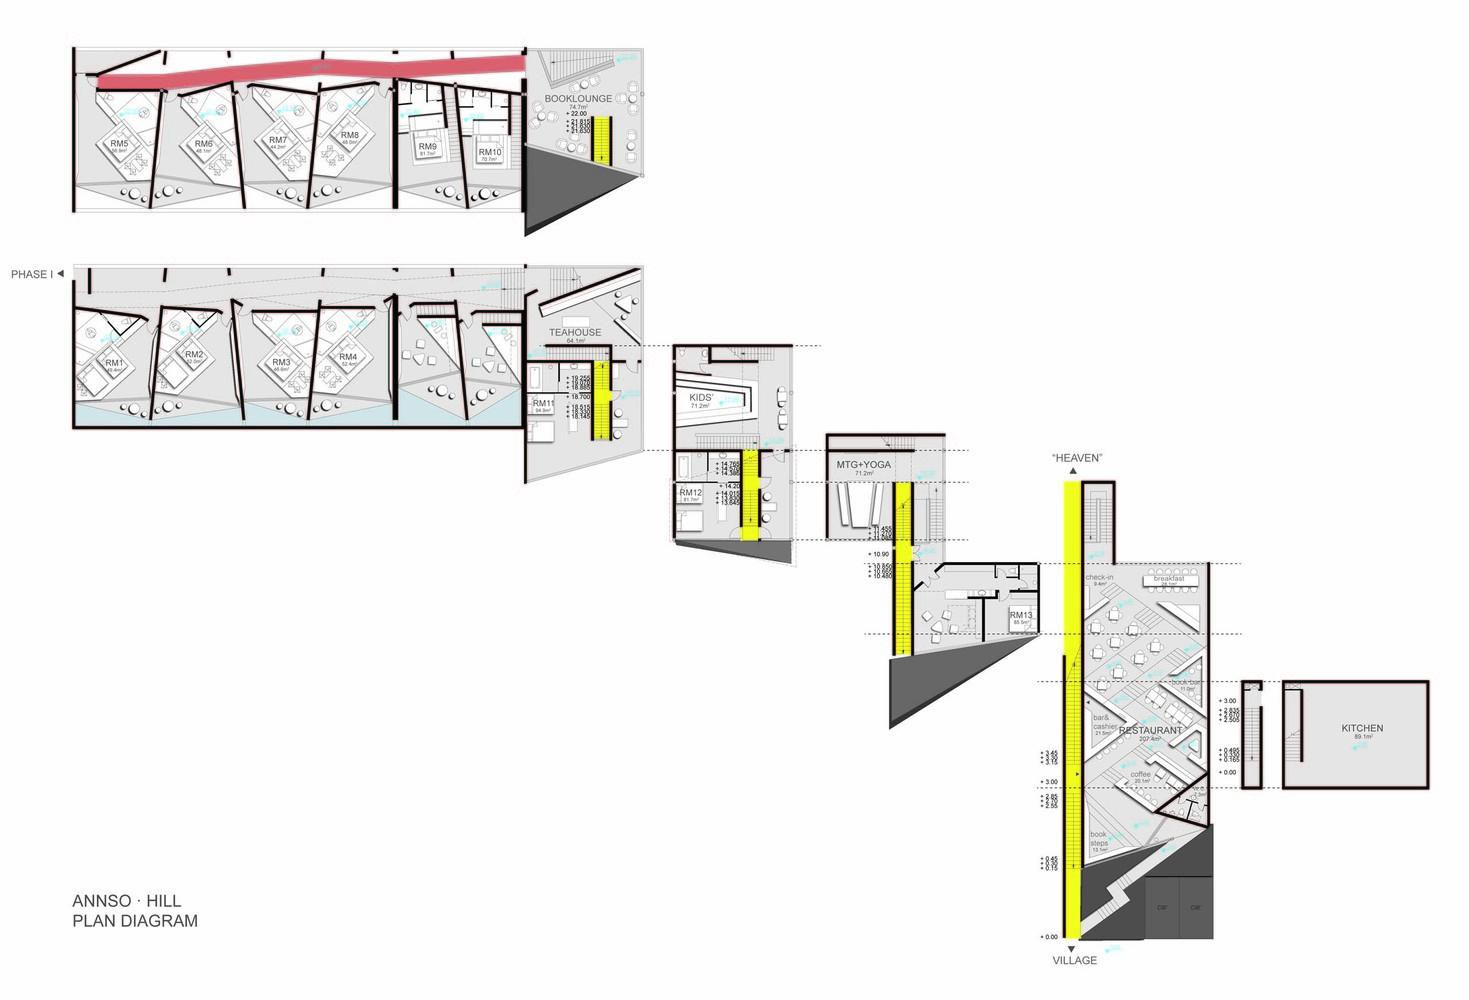 annso hill hotel studio qi plan [ 1469 x 1000 Pixel ]